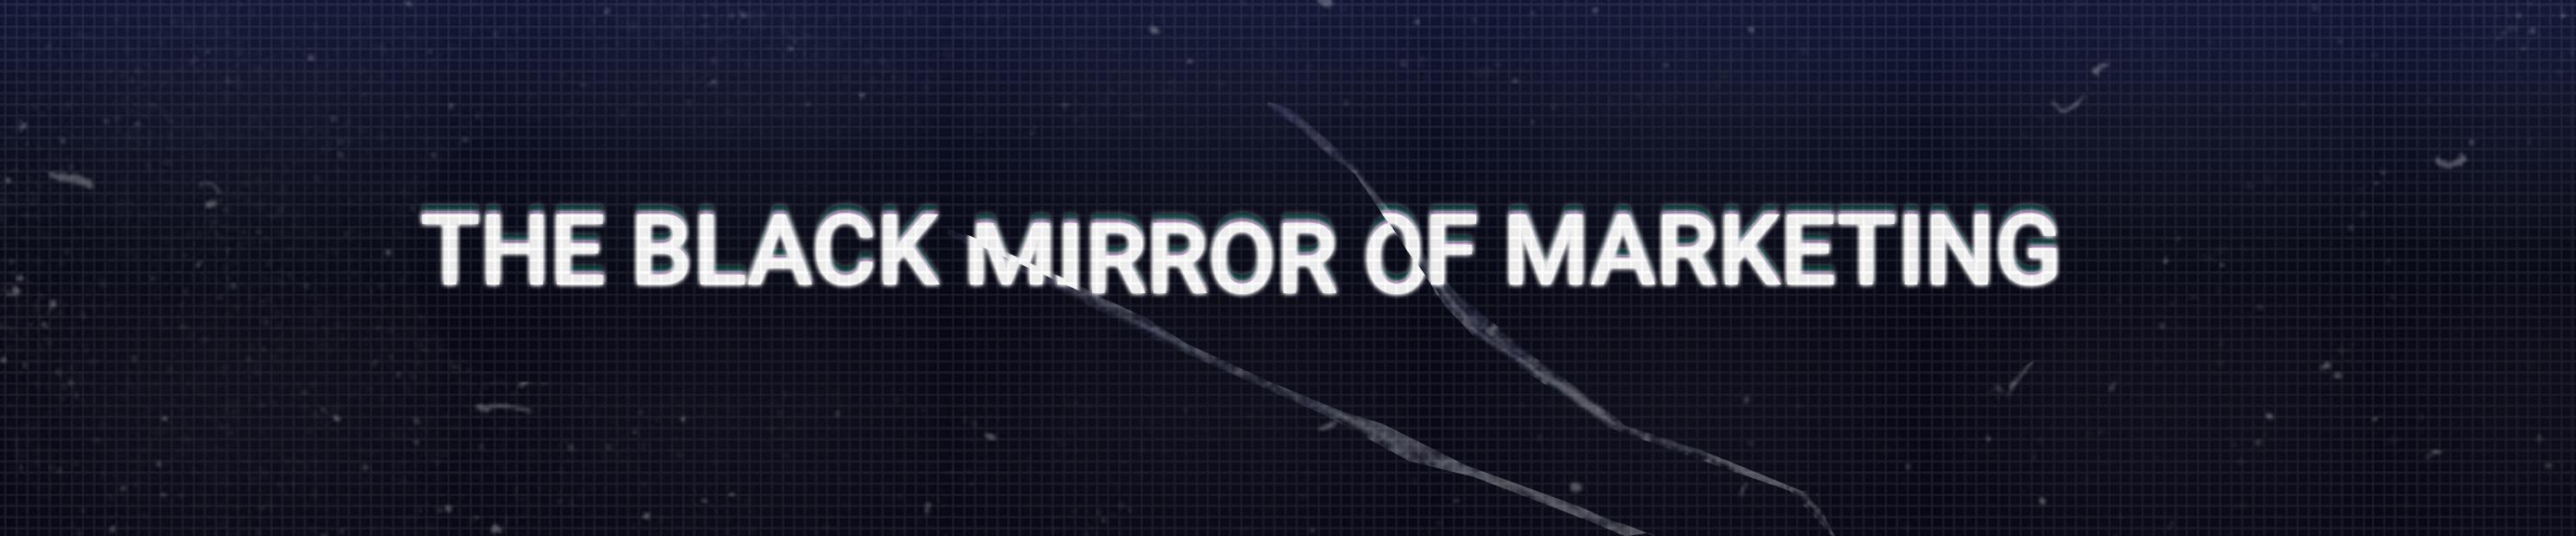 black-mirror-squaredot-banner.png